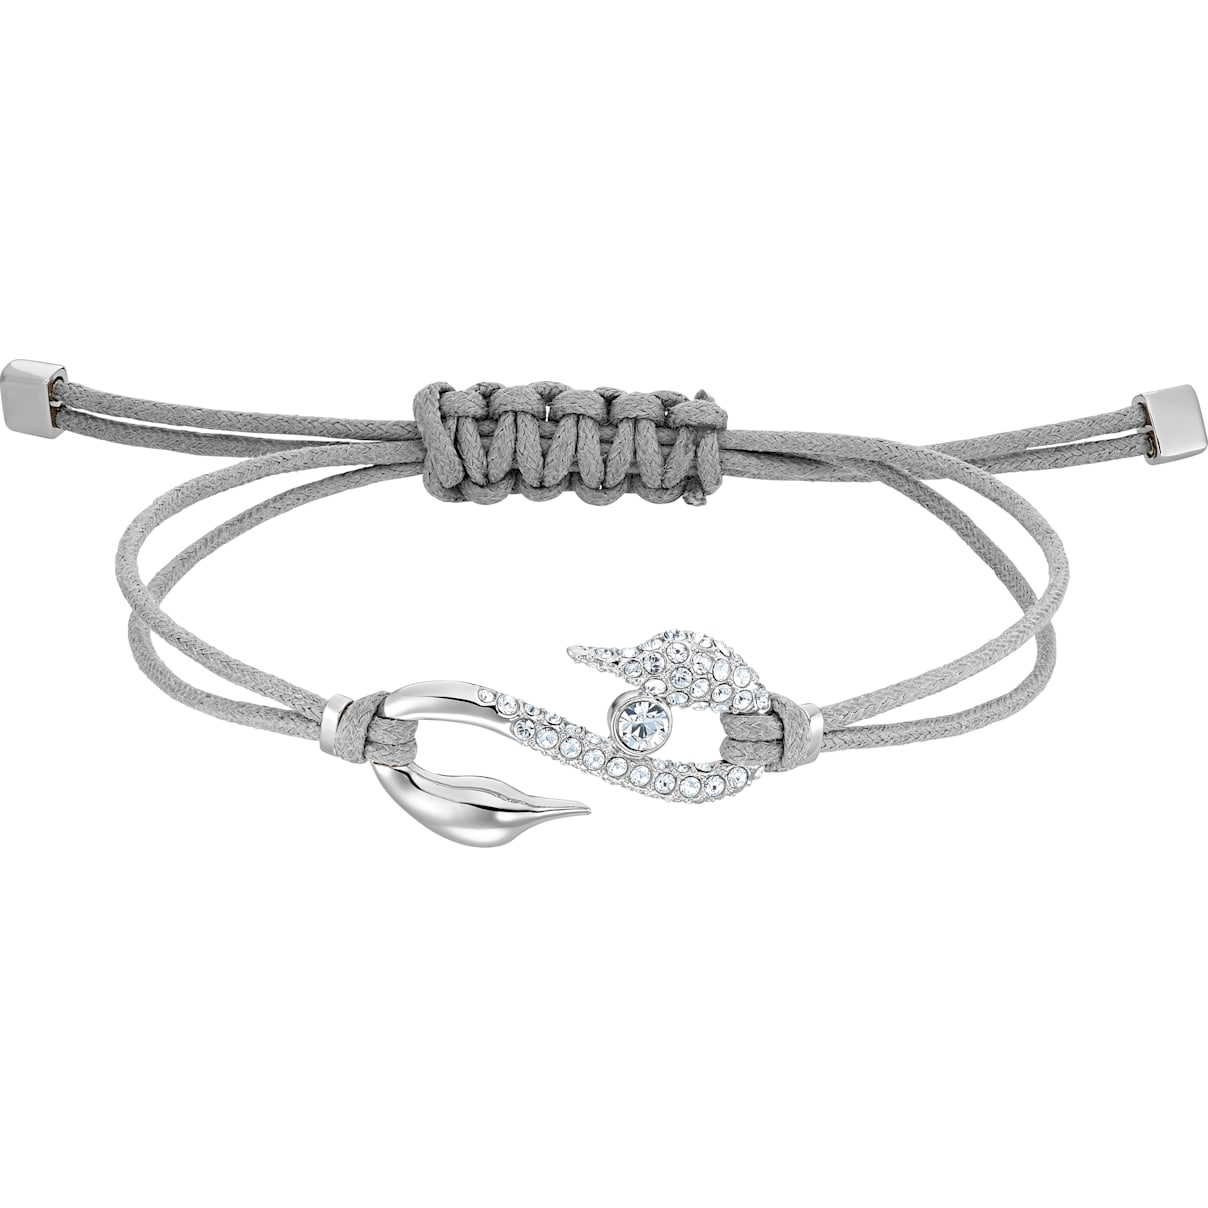 Swarovski Swarovski Power Collection Hook Bracelet, Gray, Rhodium plated